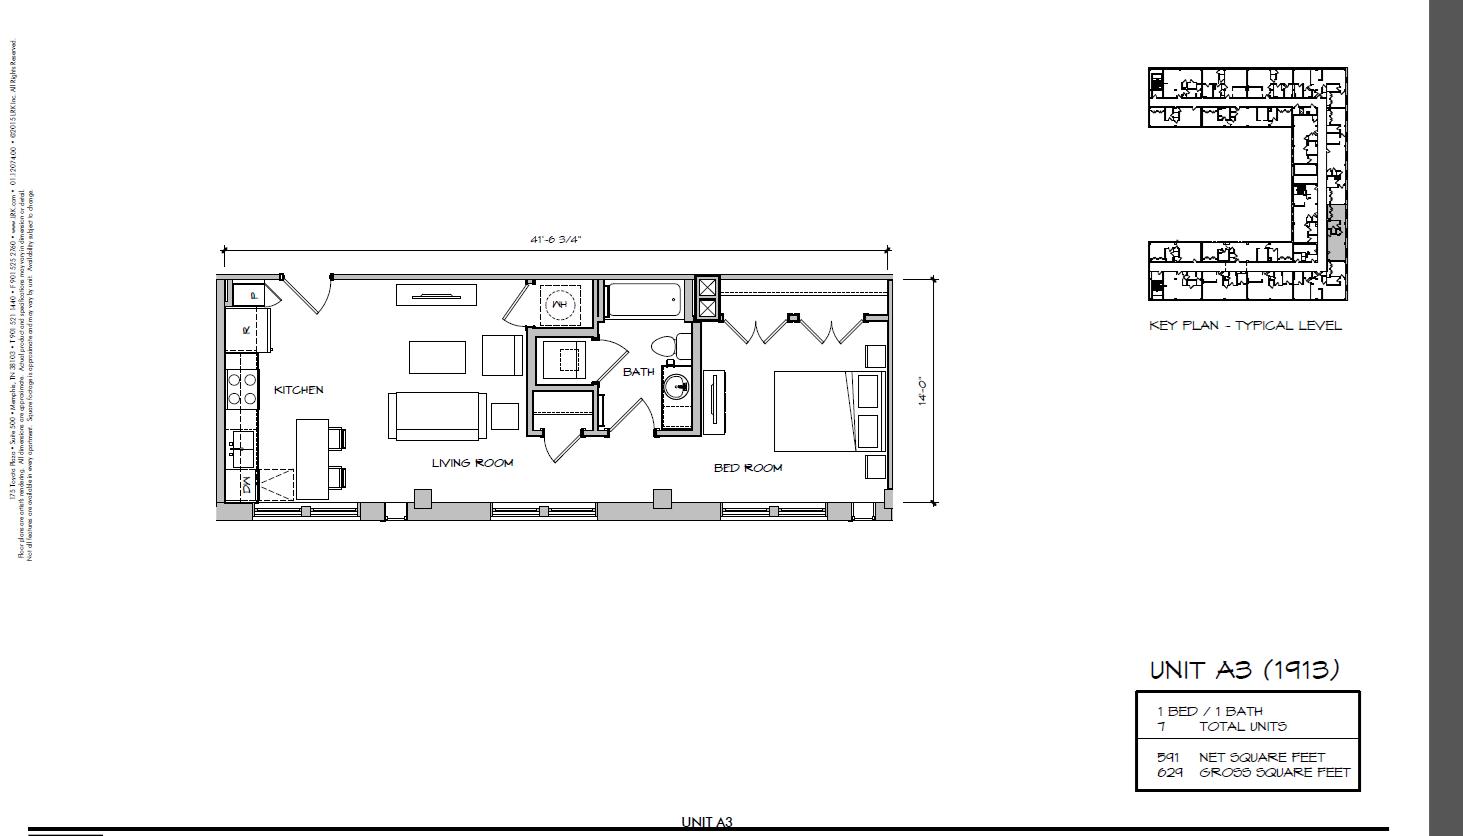 A3 - 1913 Floor Plan 10